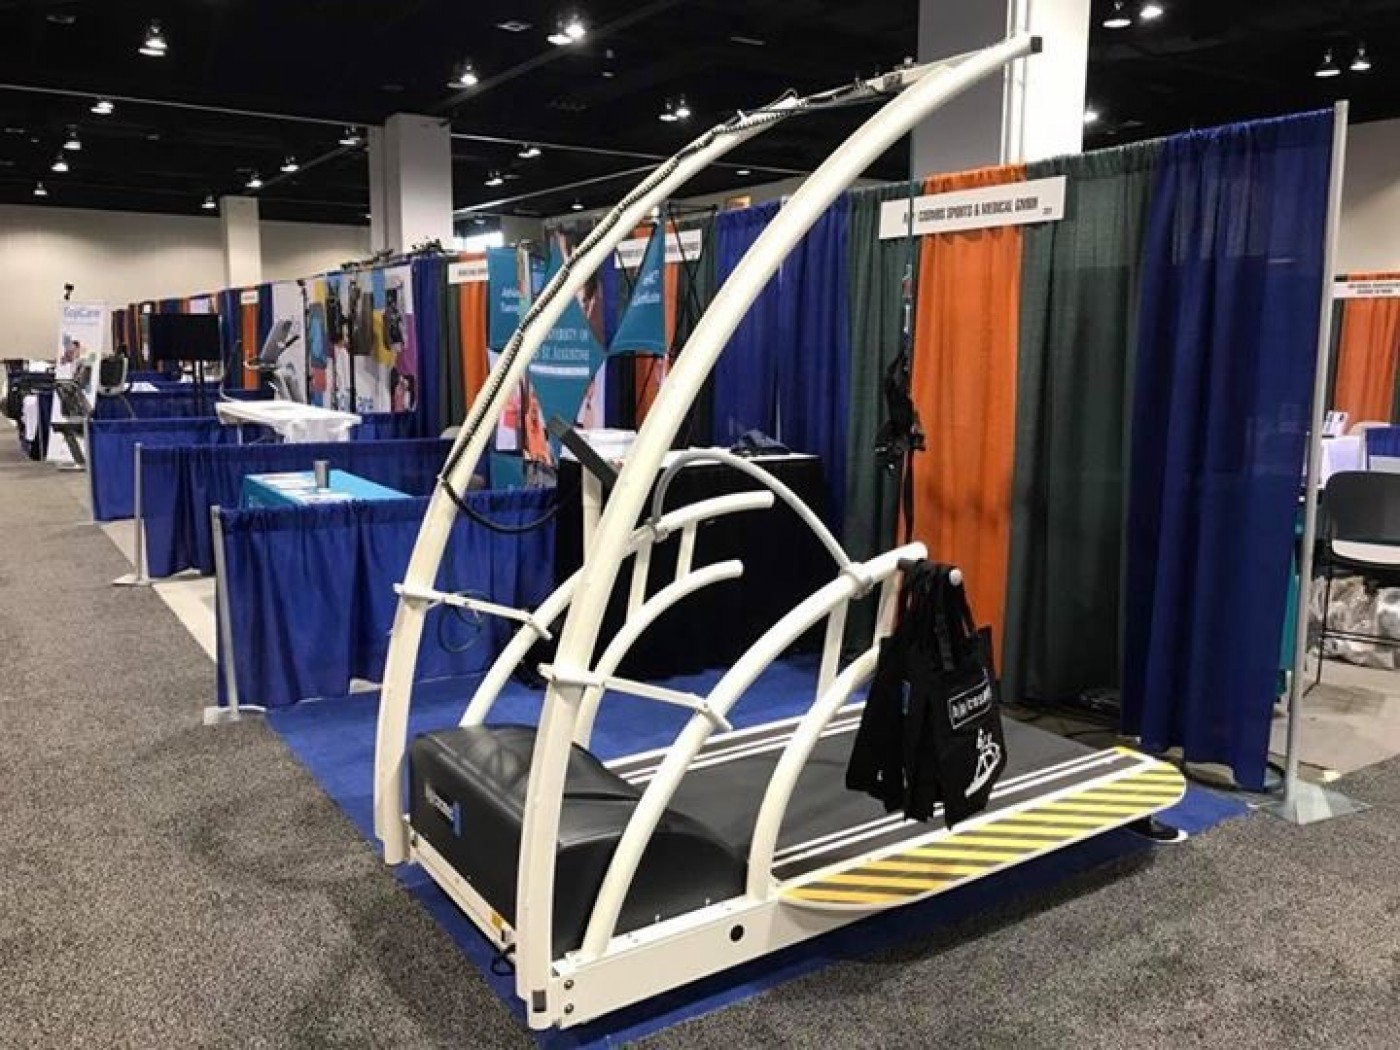 treadmill for gait analysis & biomechanics / Laufband für Ganganalyse und Biomechanik